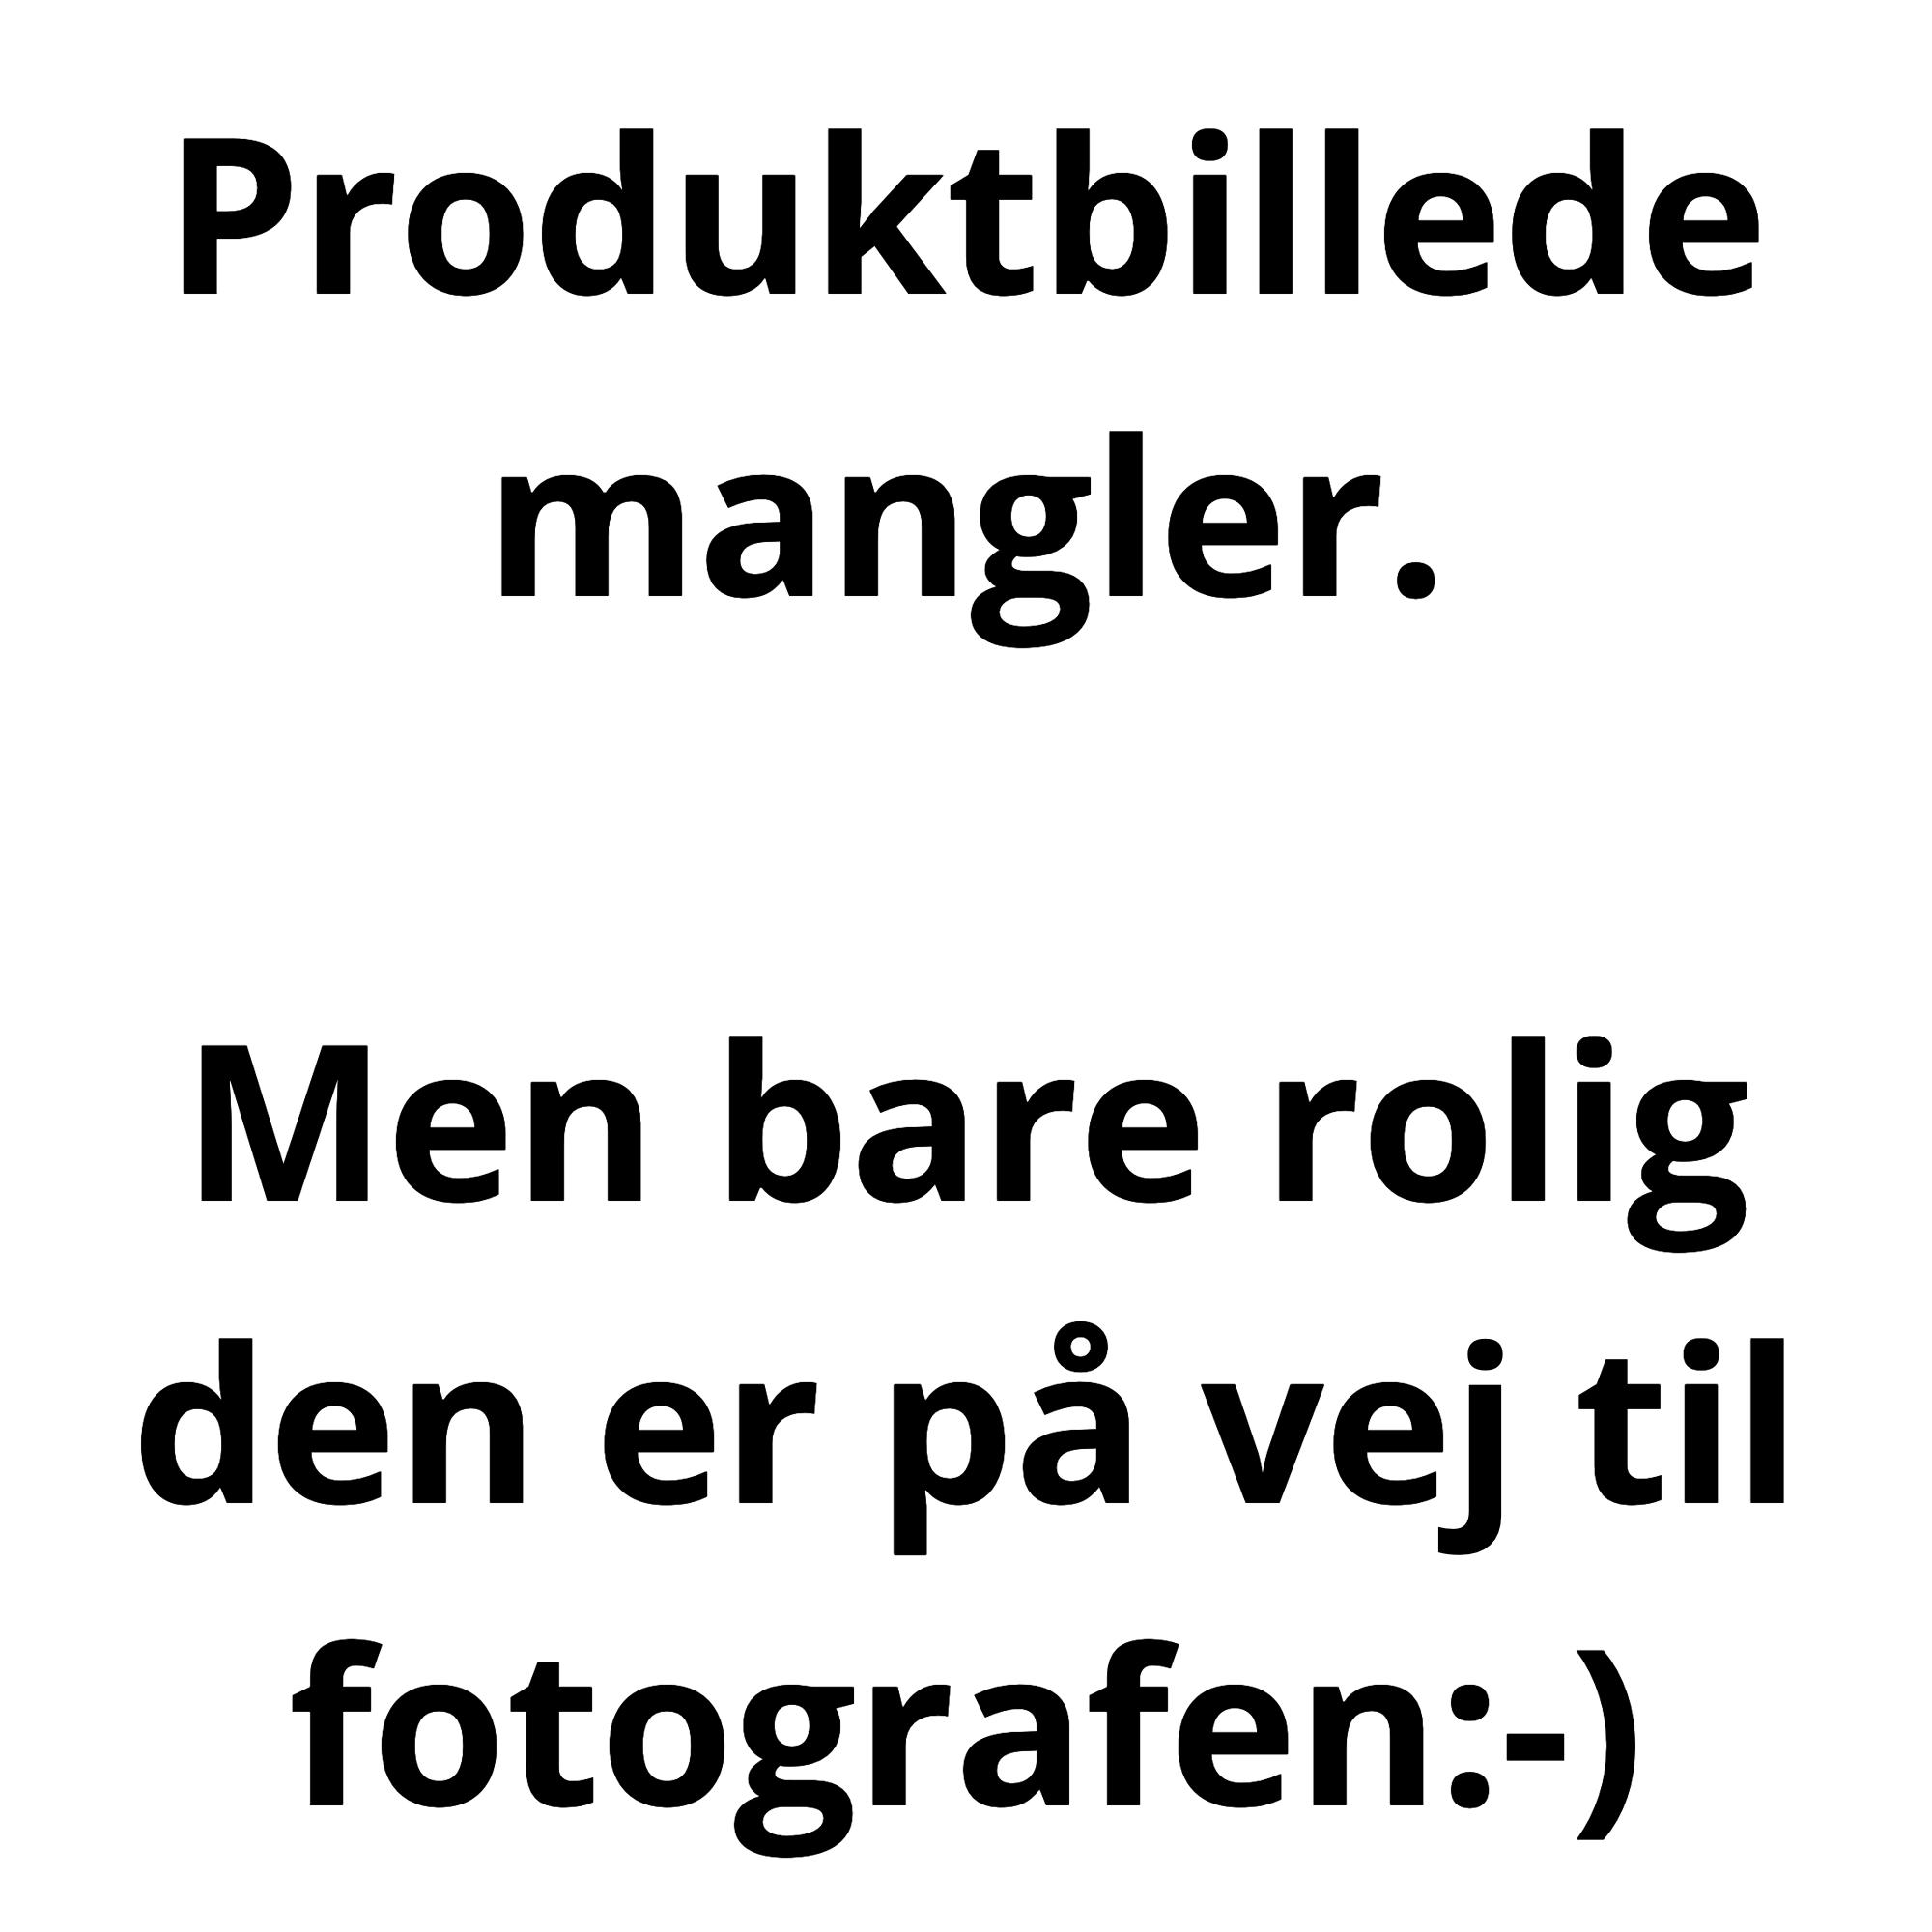 Brodit Aktiv Mobilholder med cigar adapter til Samsung Galaxy S6, S6 Edge og S7 med beskyttelsescovers - 521724